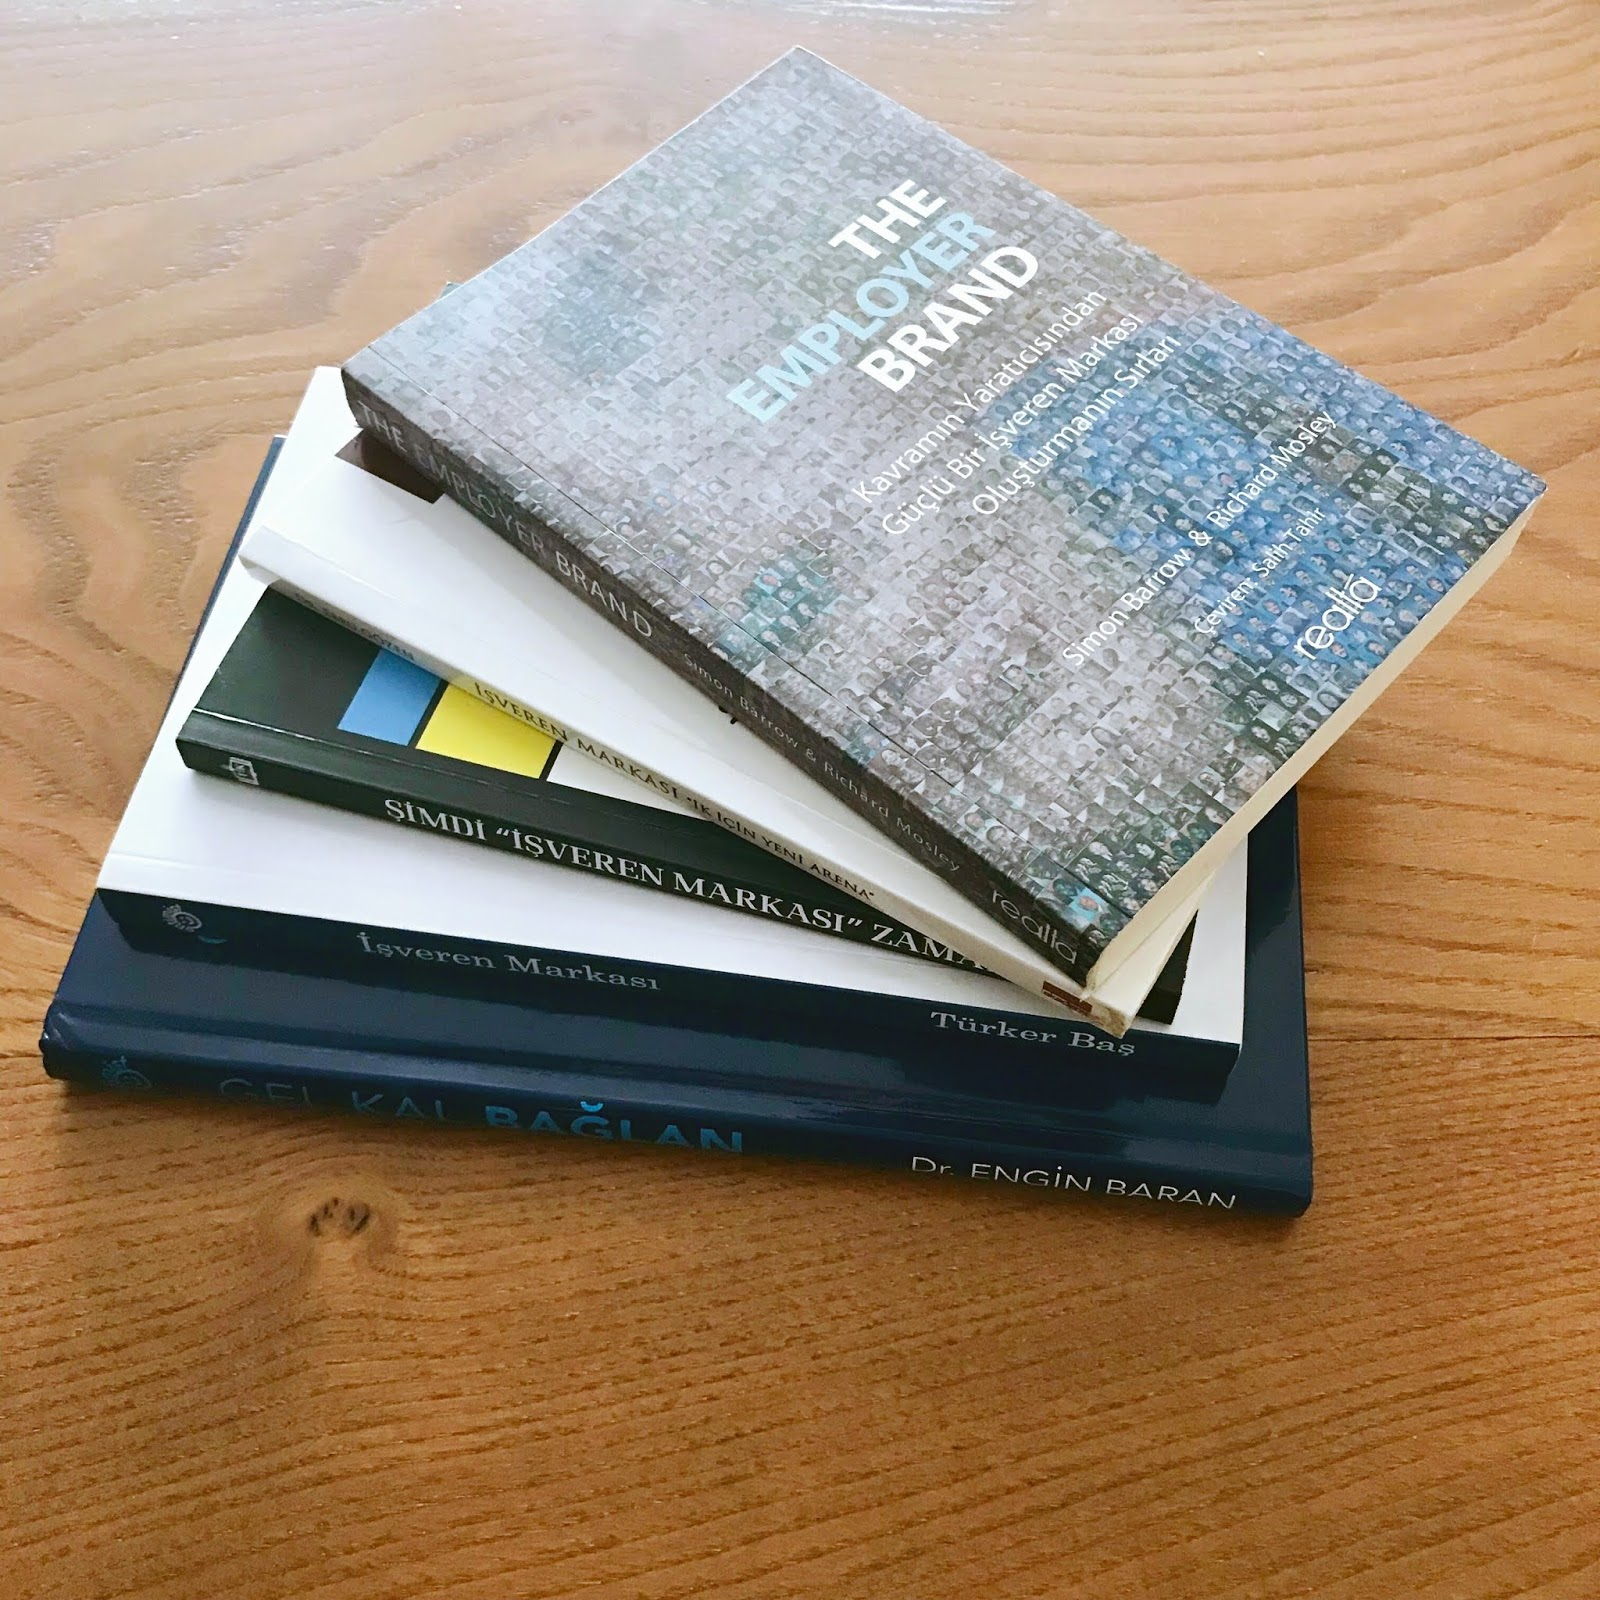 Isveren Markasi Ile Ilgili Kitaplar (Kitap)